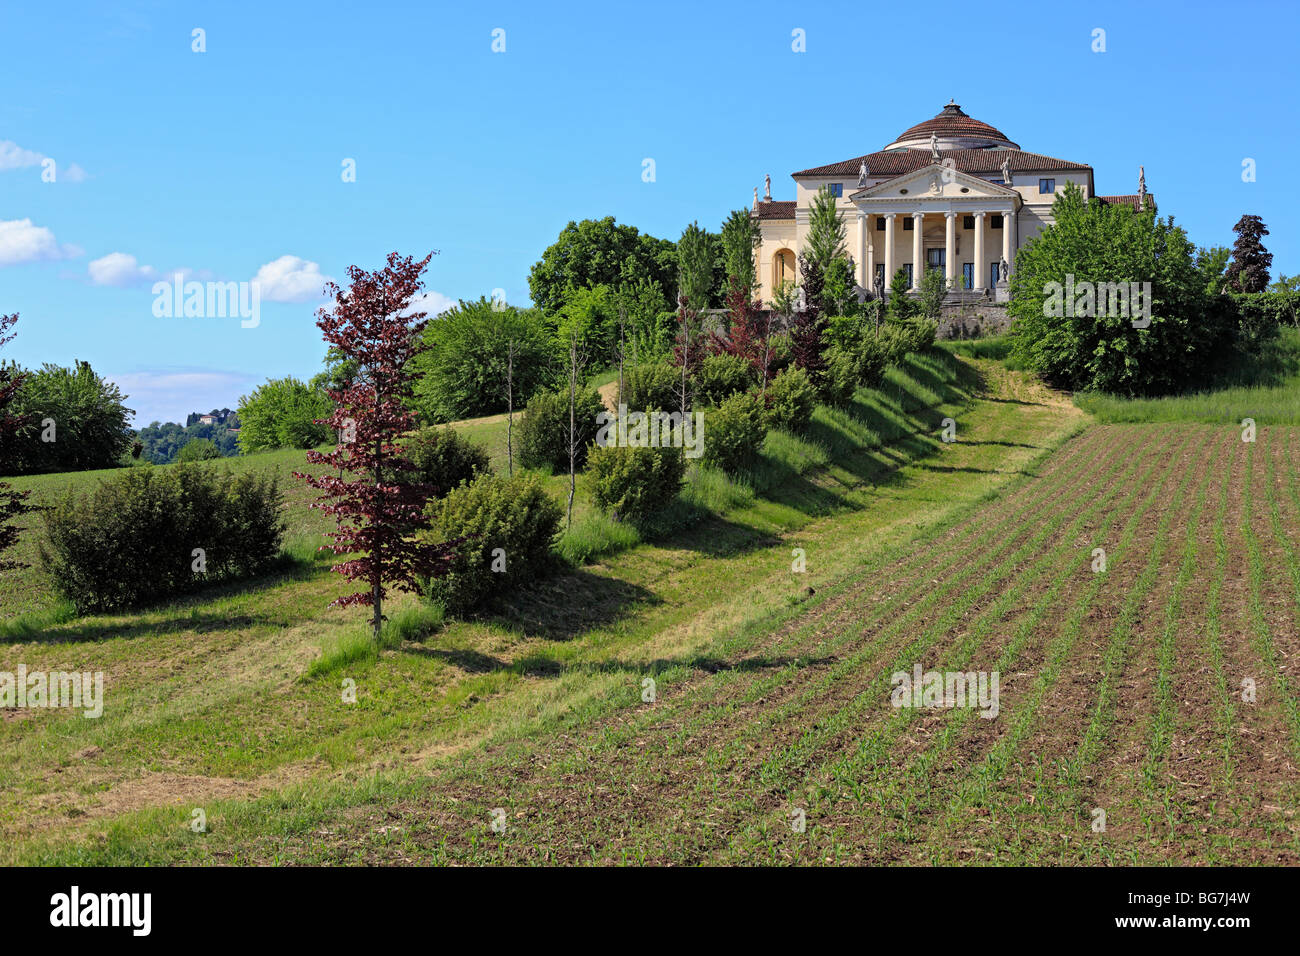 - Villa Capra &... Palladio Villa Rotunda